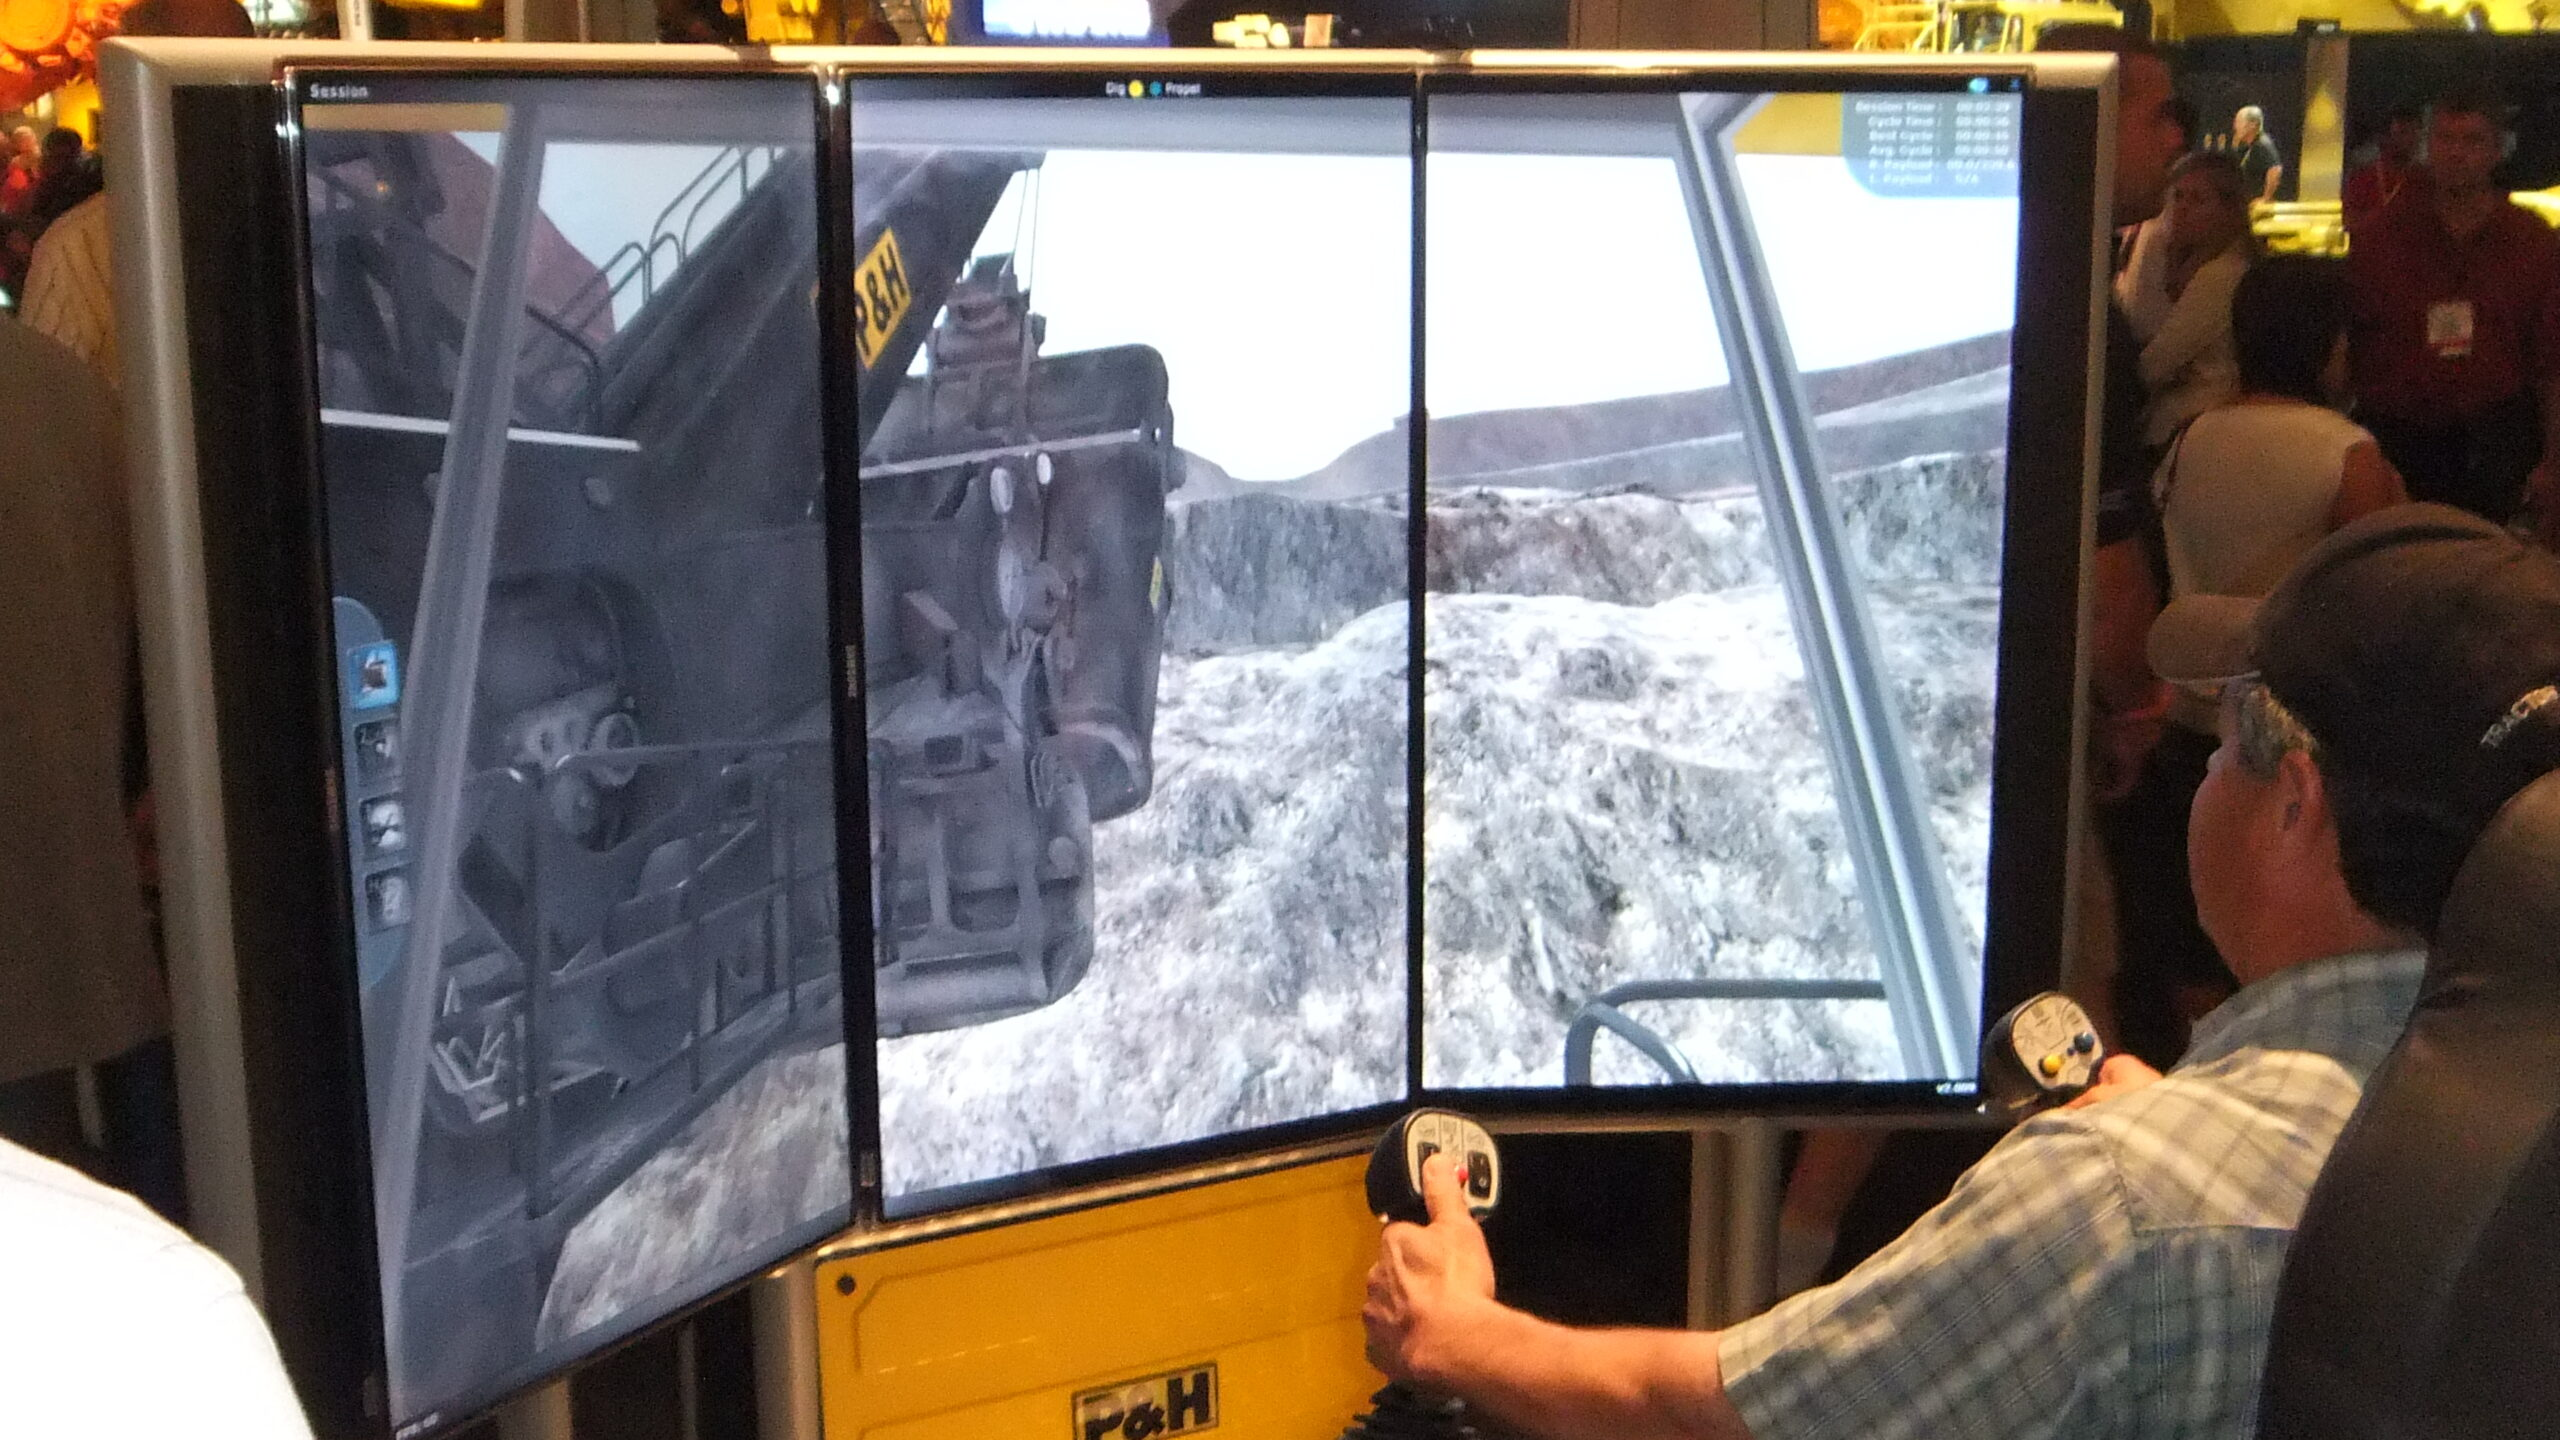 Komatsu P&H Mining Electric Rope Shovel Training Simulator by ForgeFX Simulations